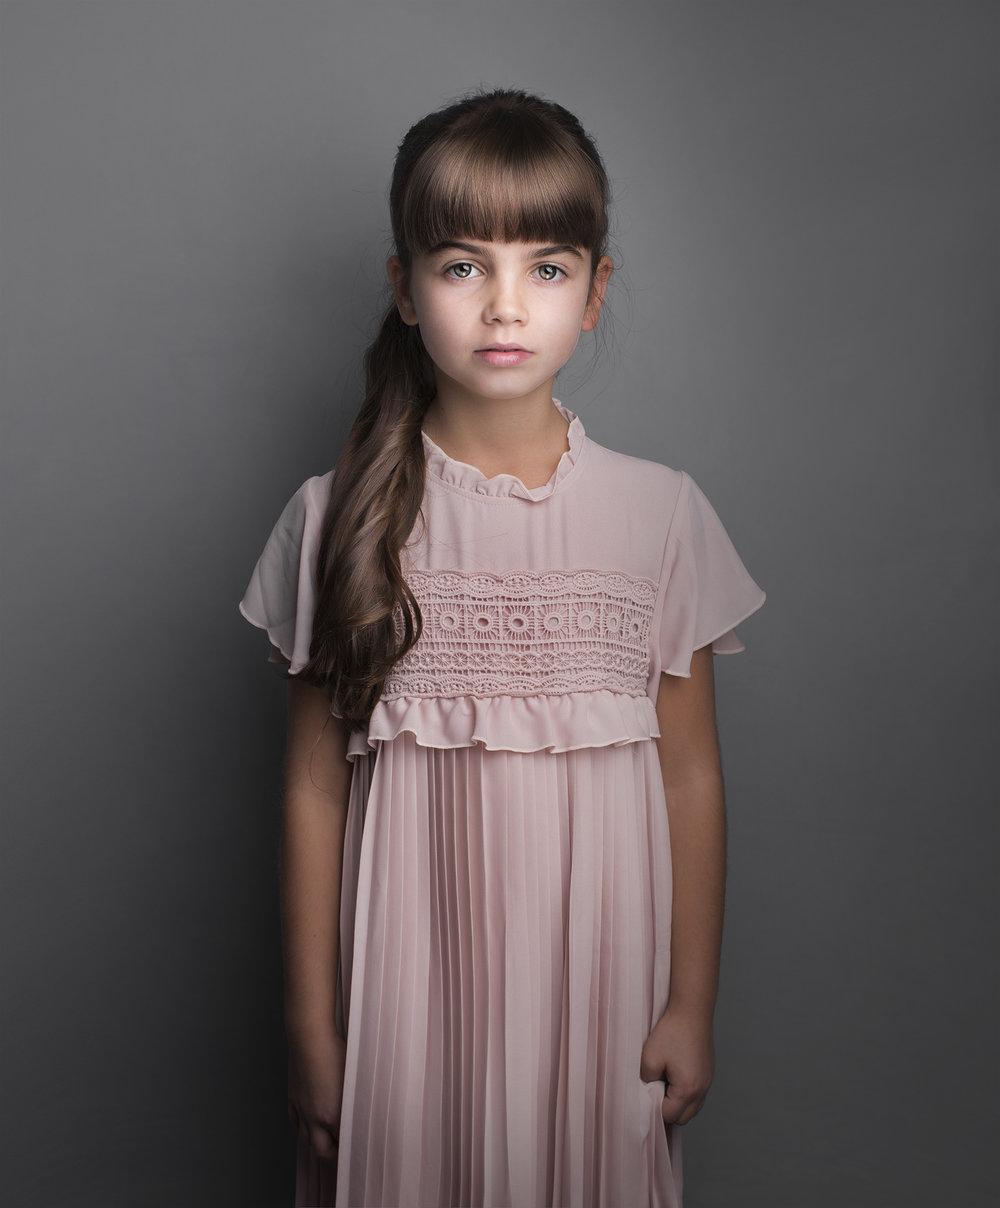 elizabethgphotography_fineart_kingslangley_london_hertfordshire_portrait_childrens_chloe_2.jpg